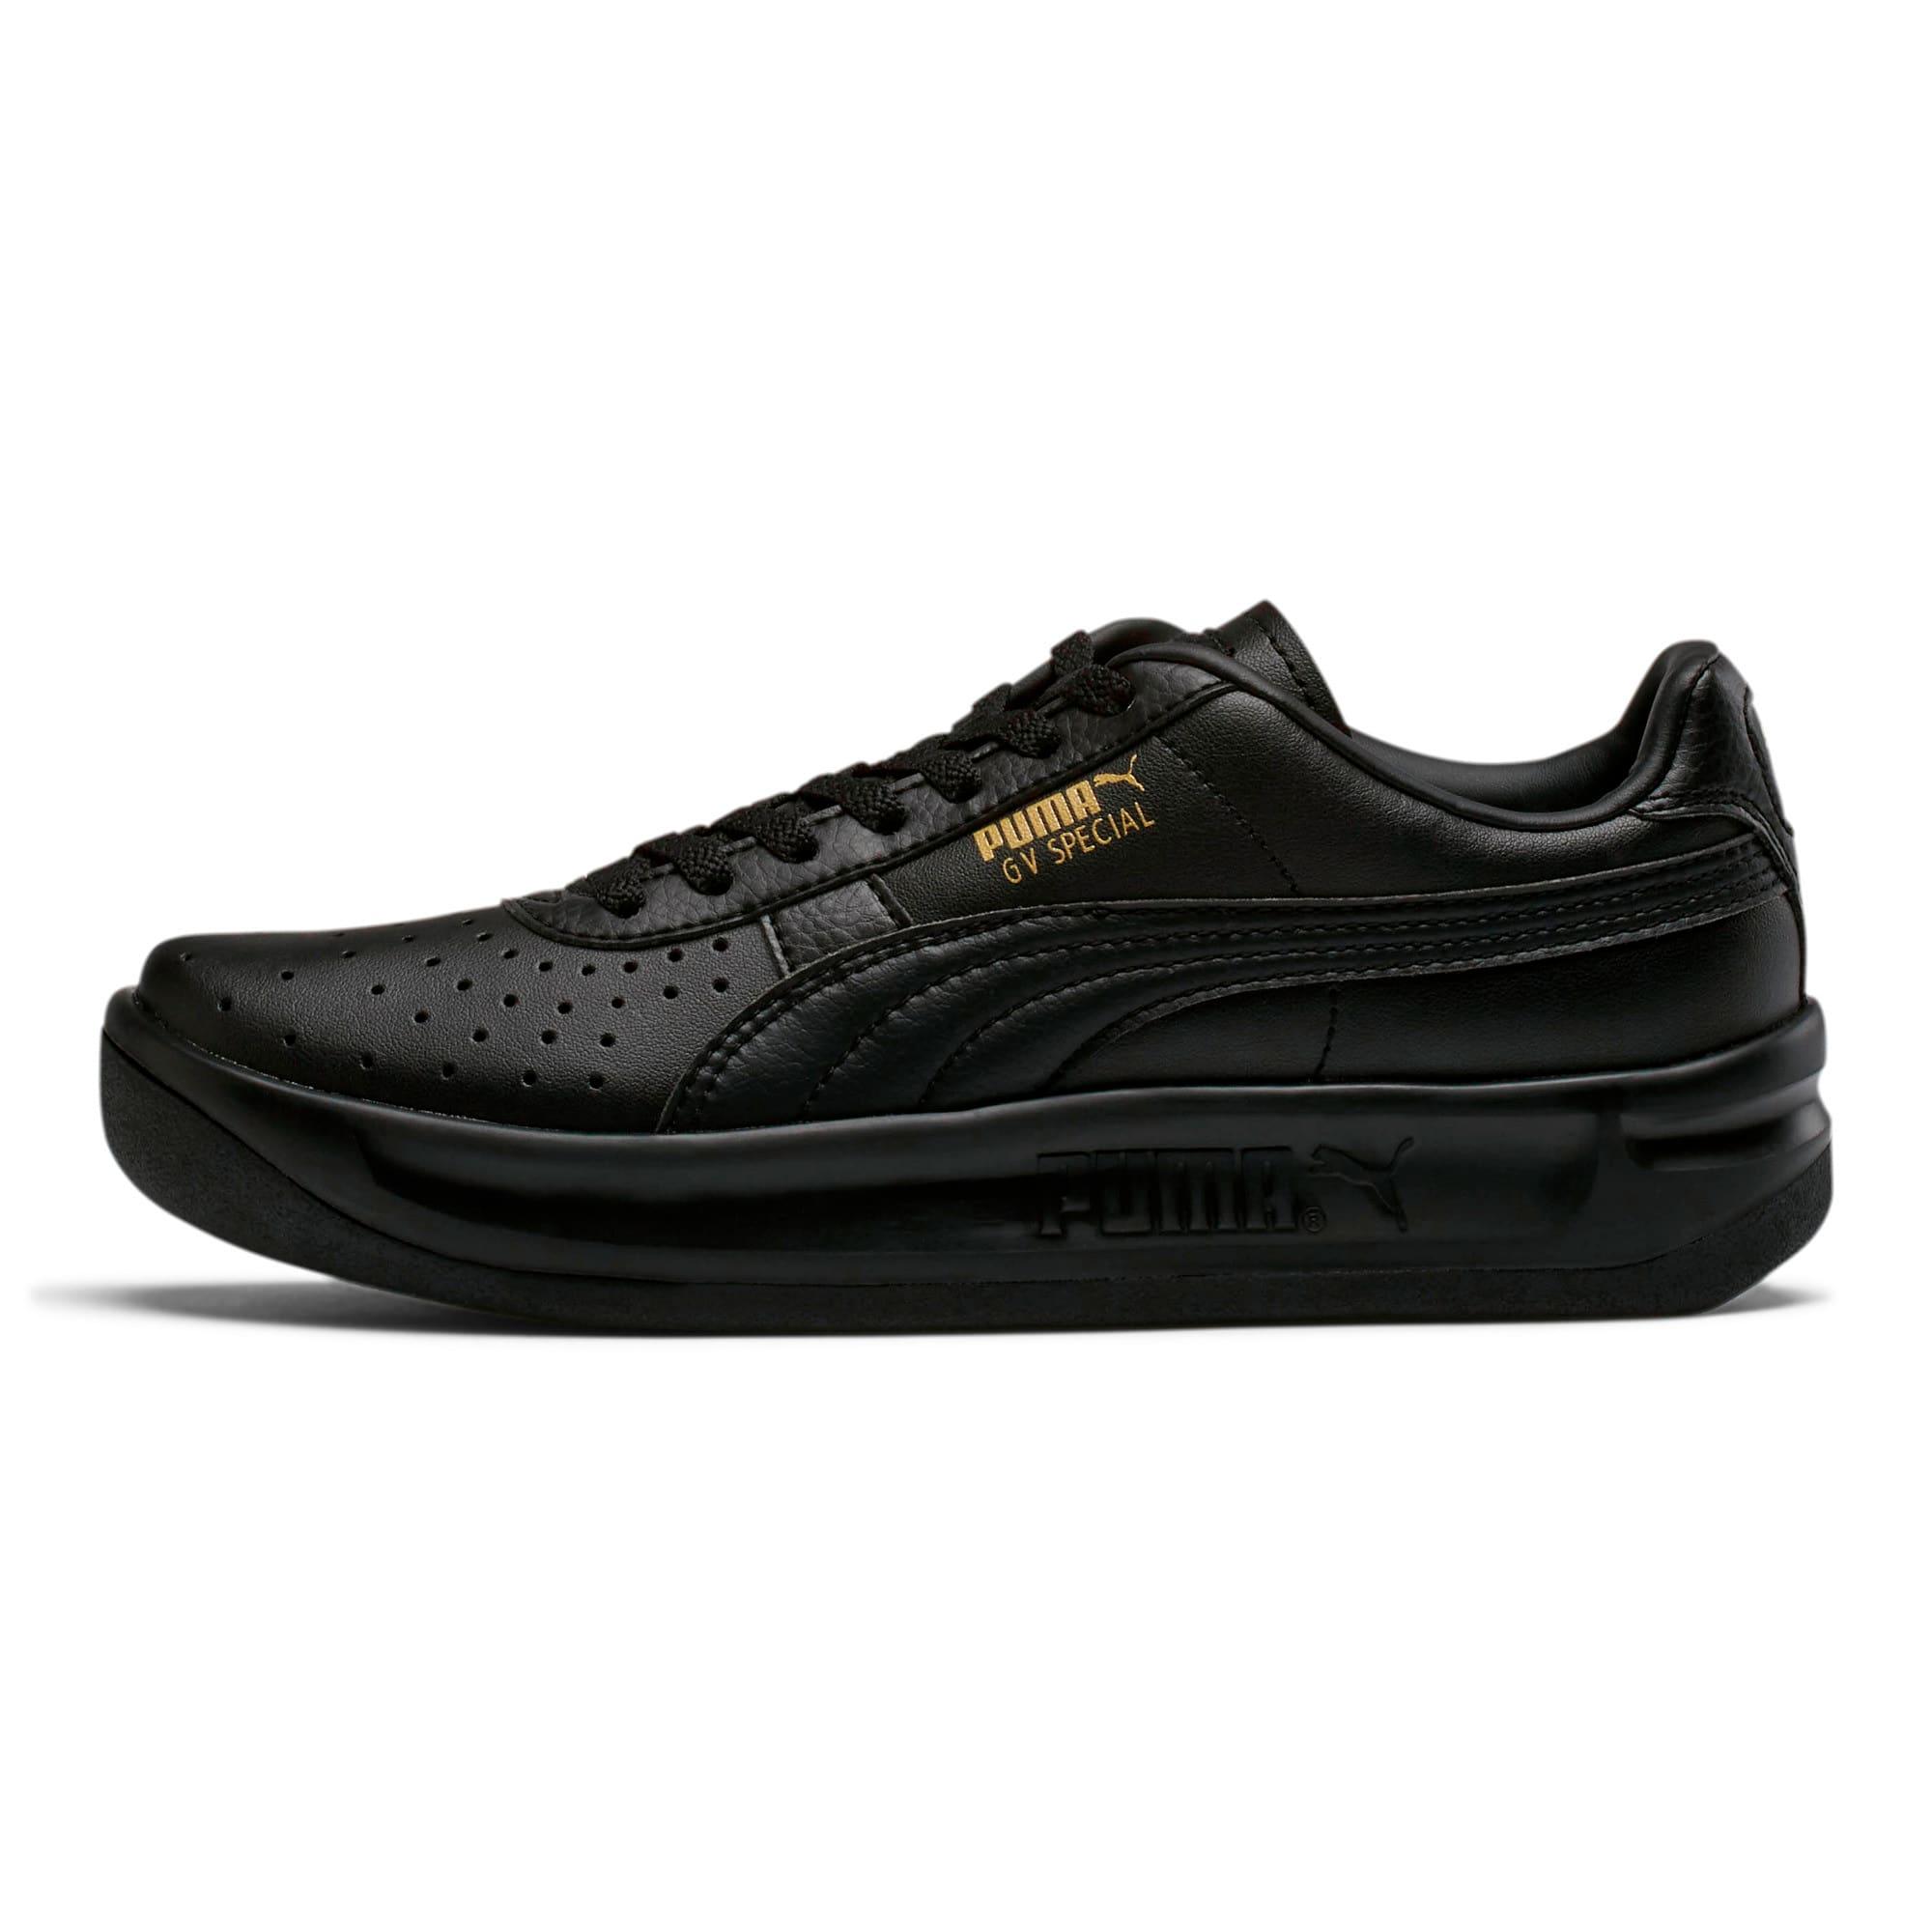 Thumbnail 1 of GV Special Sneakers JR, Puma Black-Puma Team Gold, medium